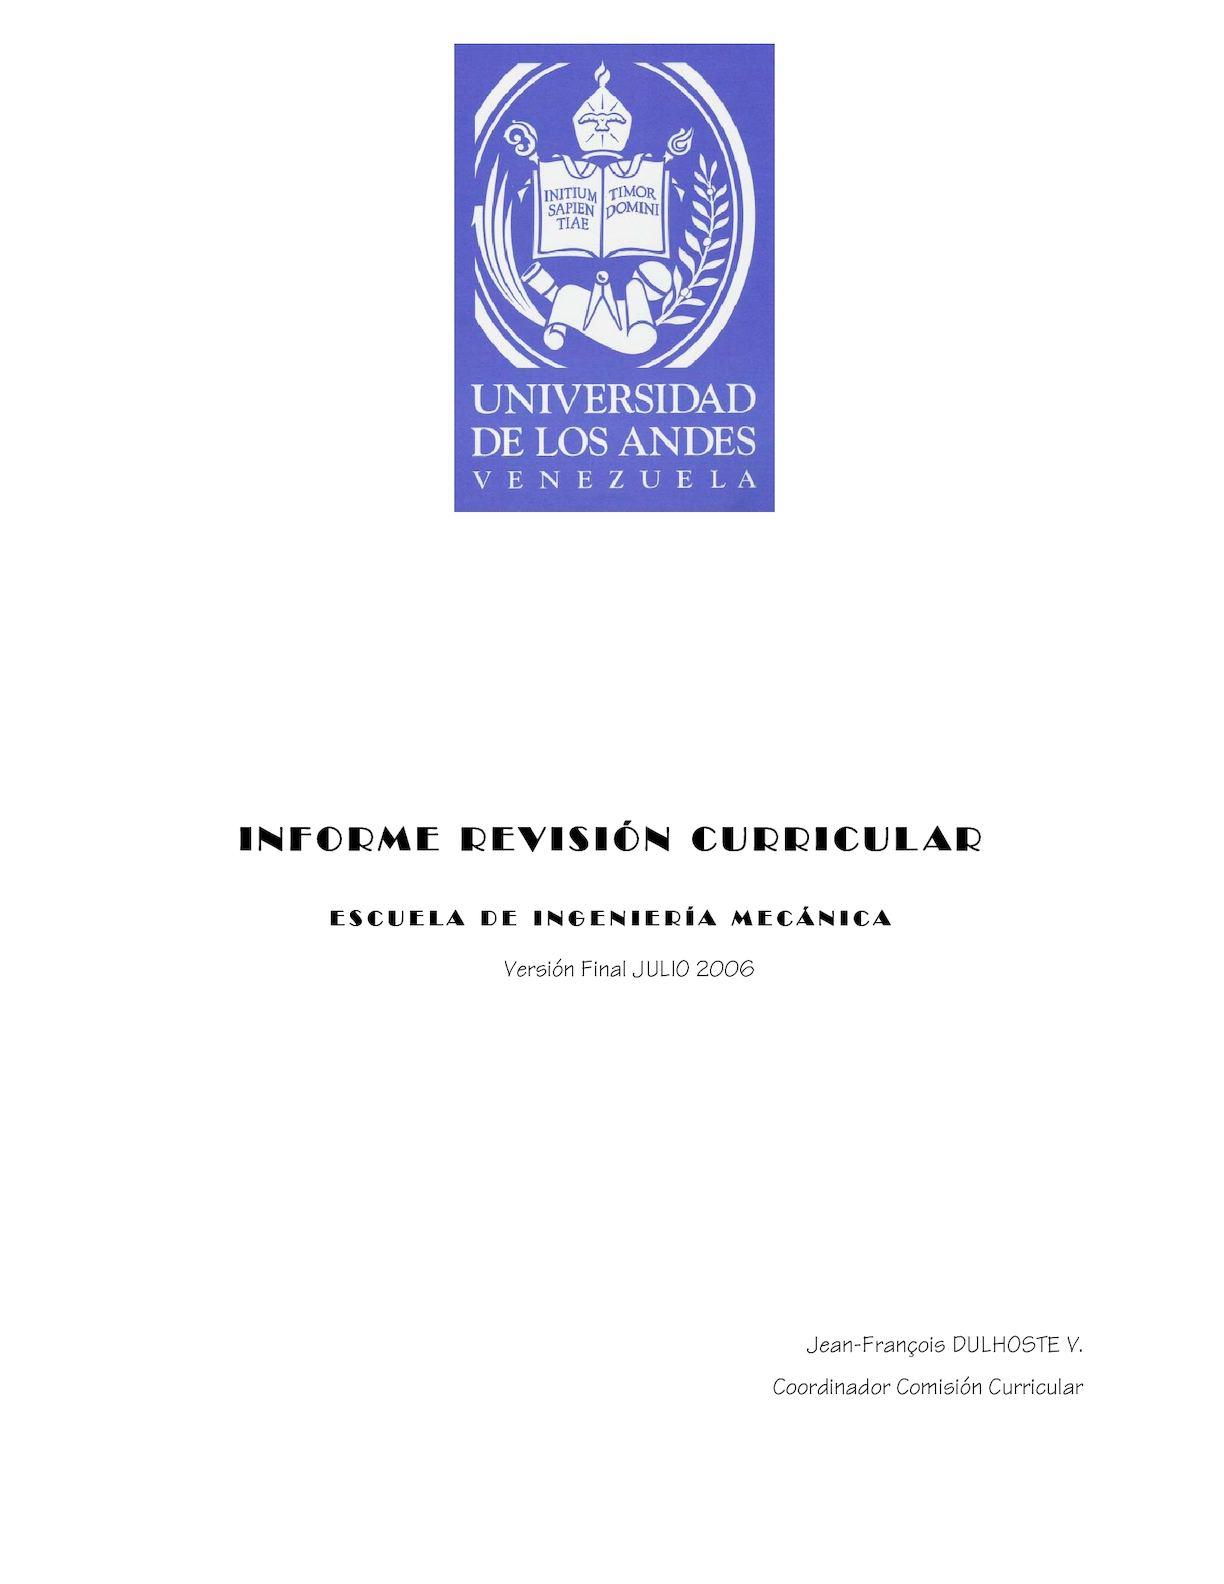 Informe Completo 1 284